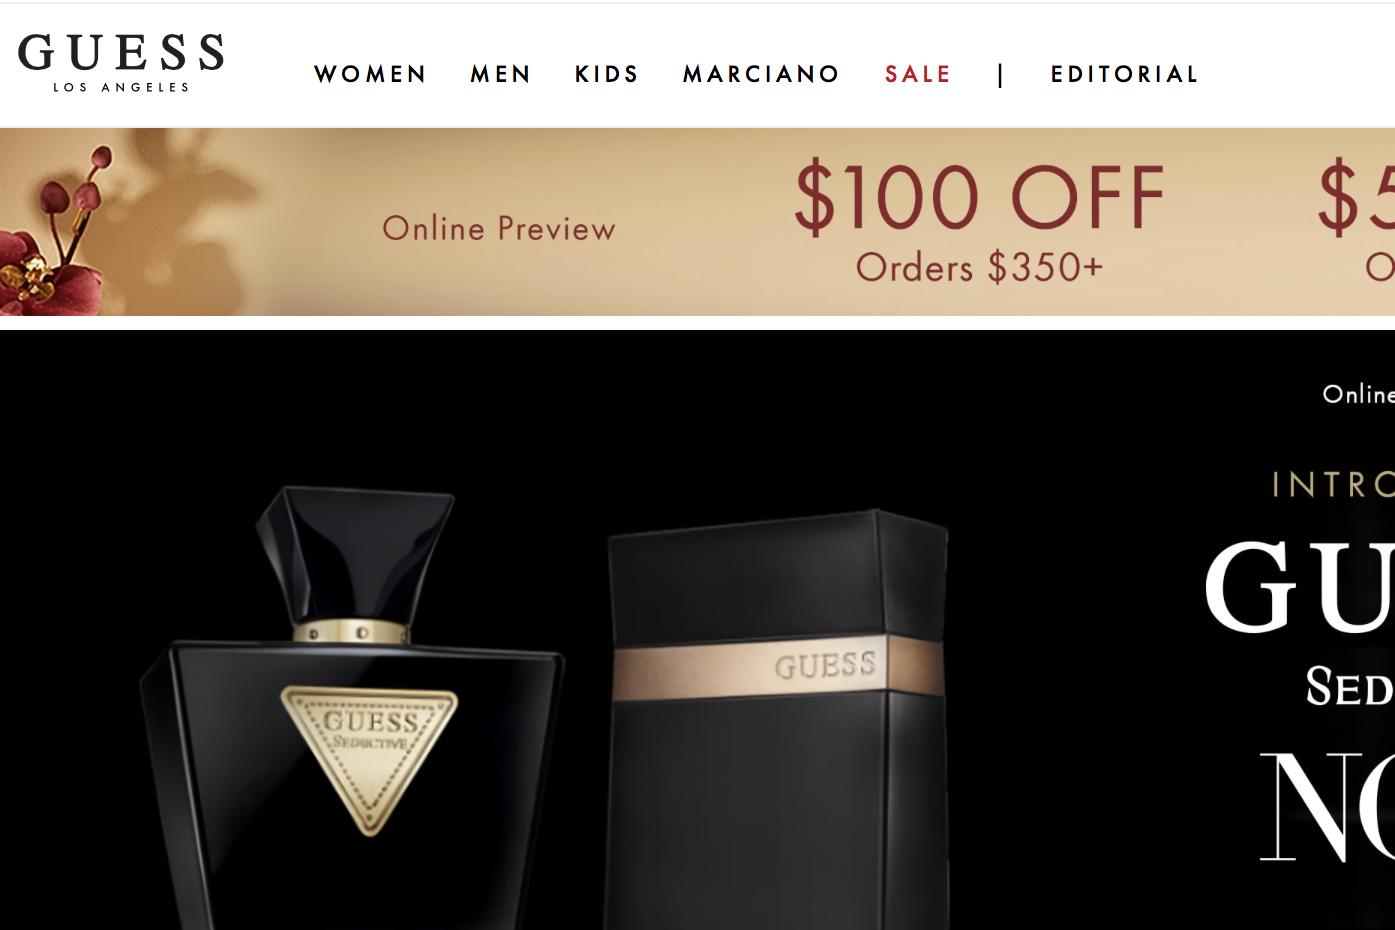 Montblanc 和 Guess 品牌香水表现出色,推动 Inter Parfums 第三季度销售额同比增长7.9%